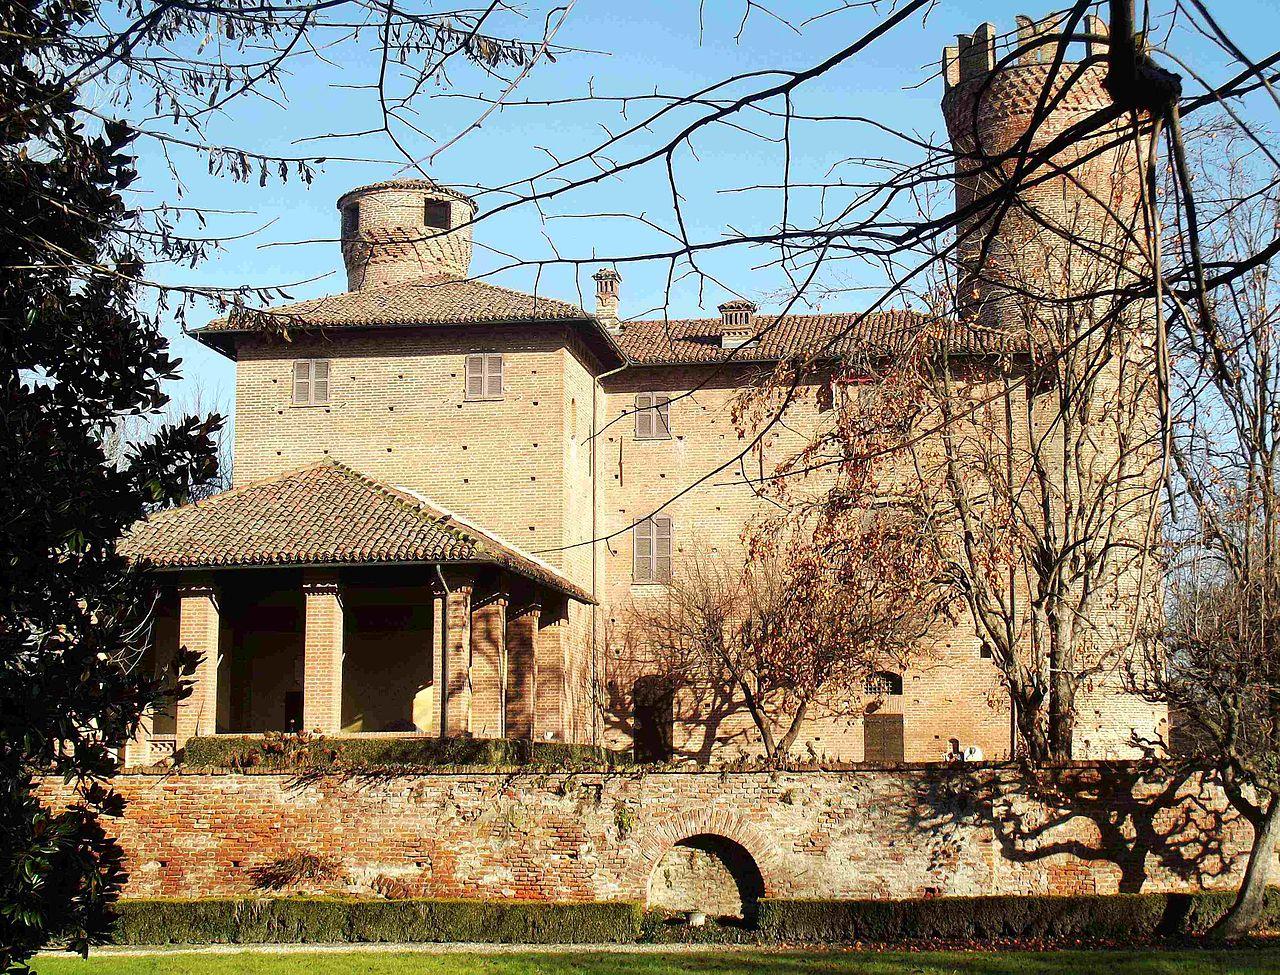 Castello Villar Dora